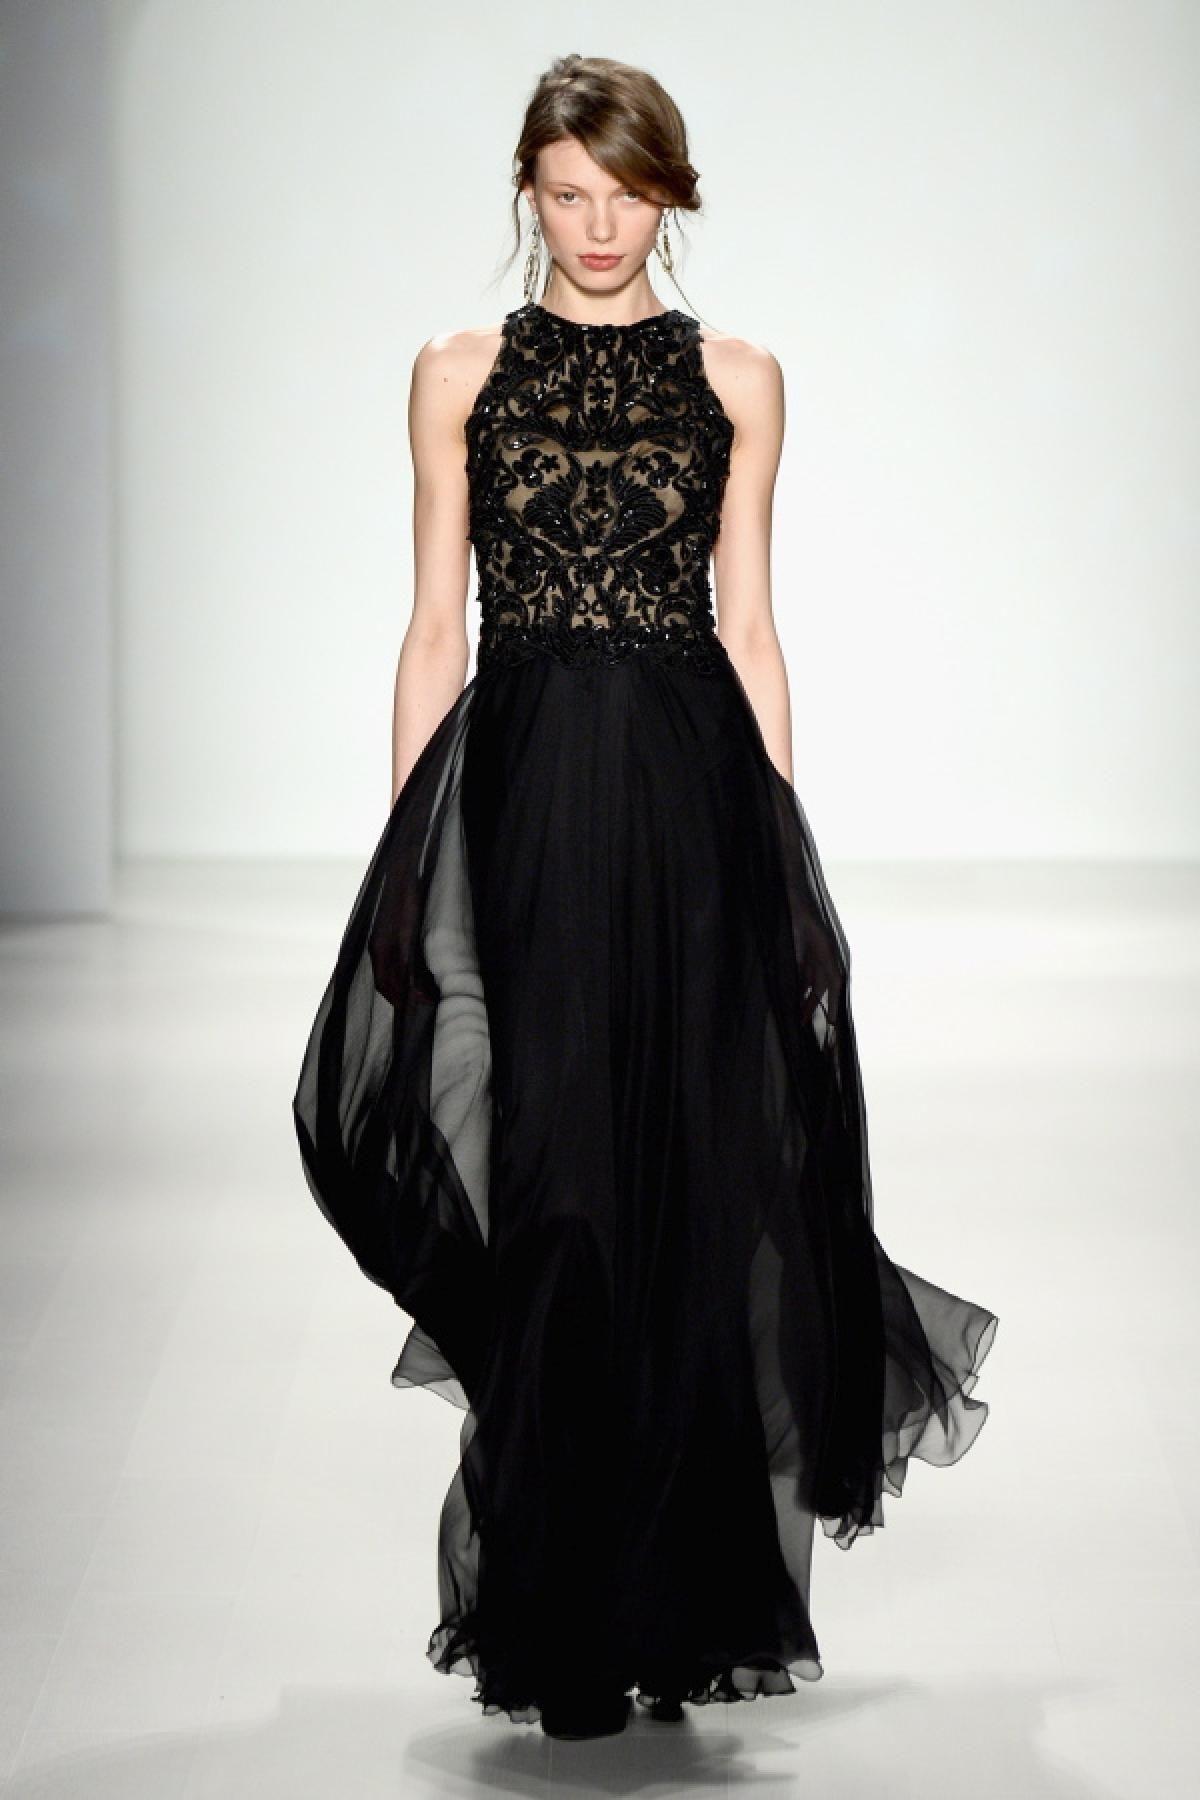 New york fashion week fall tadashi shoji dresses pinterest